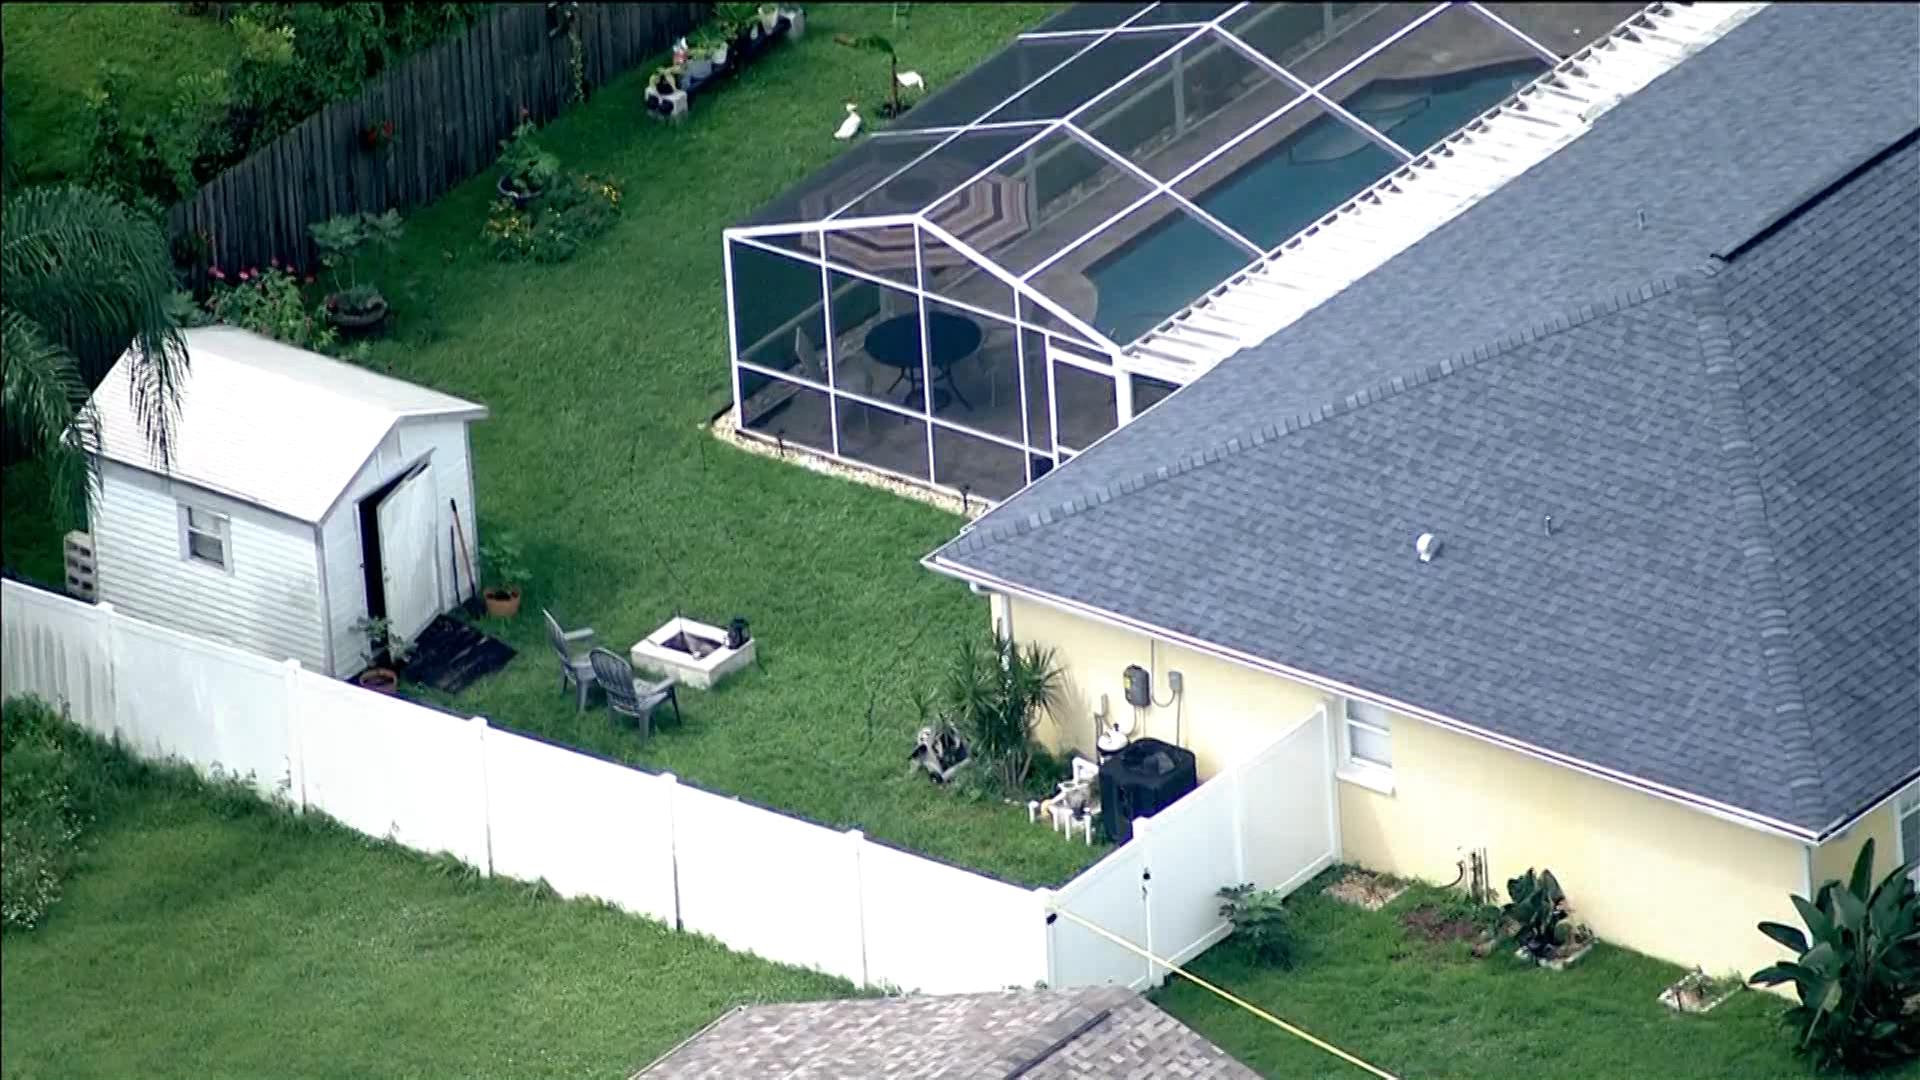 Gabby Petito investigation: Florida police search warrant provides new details